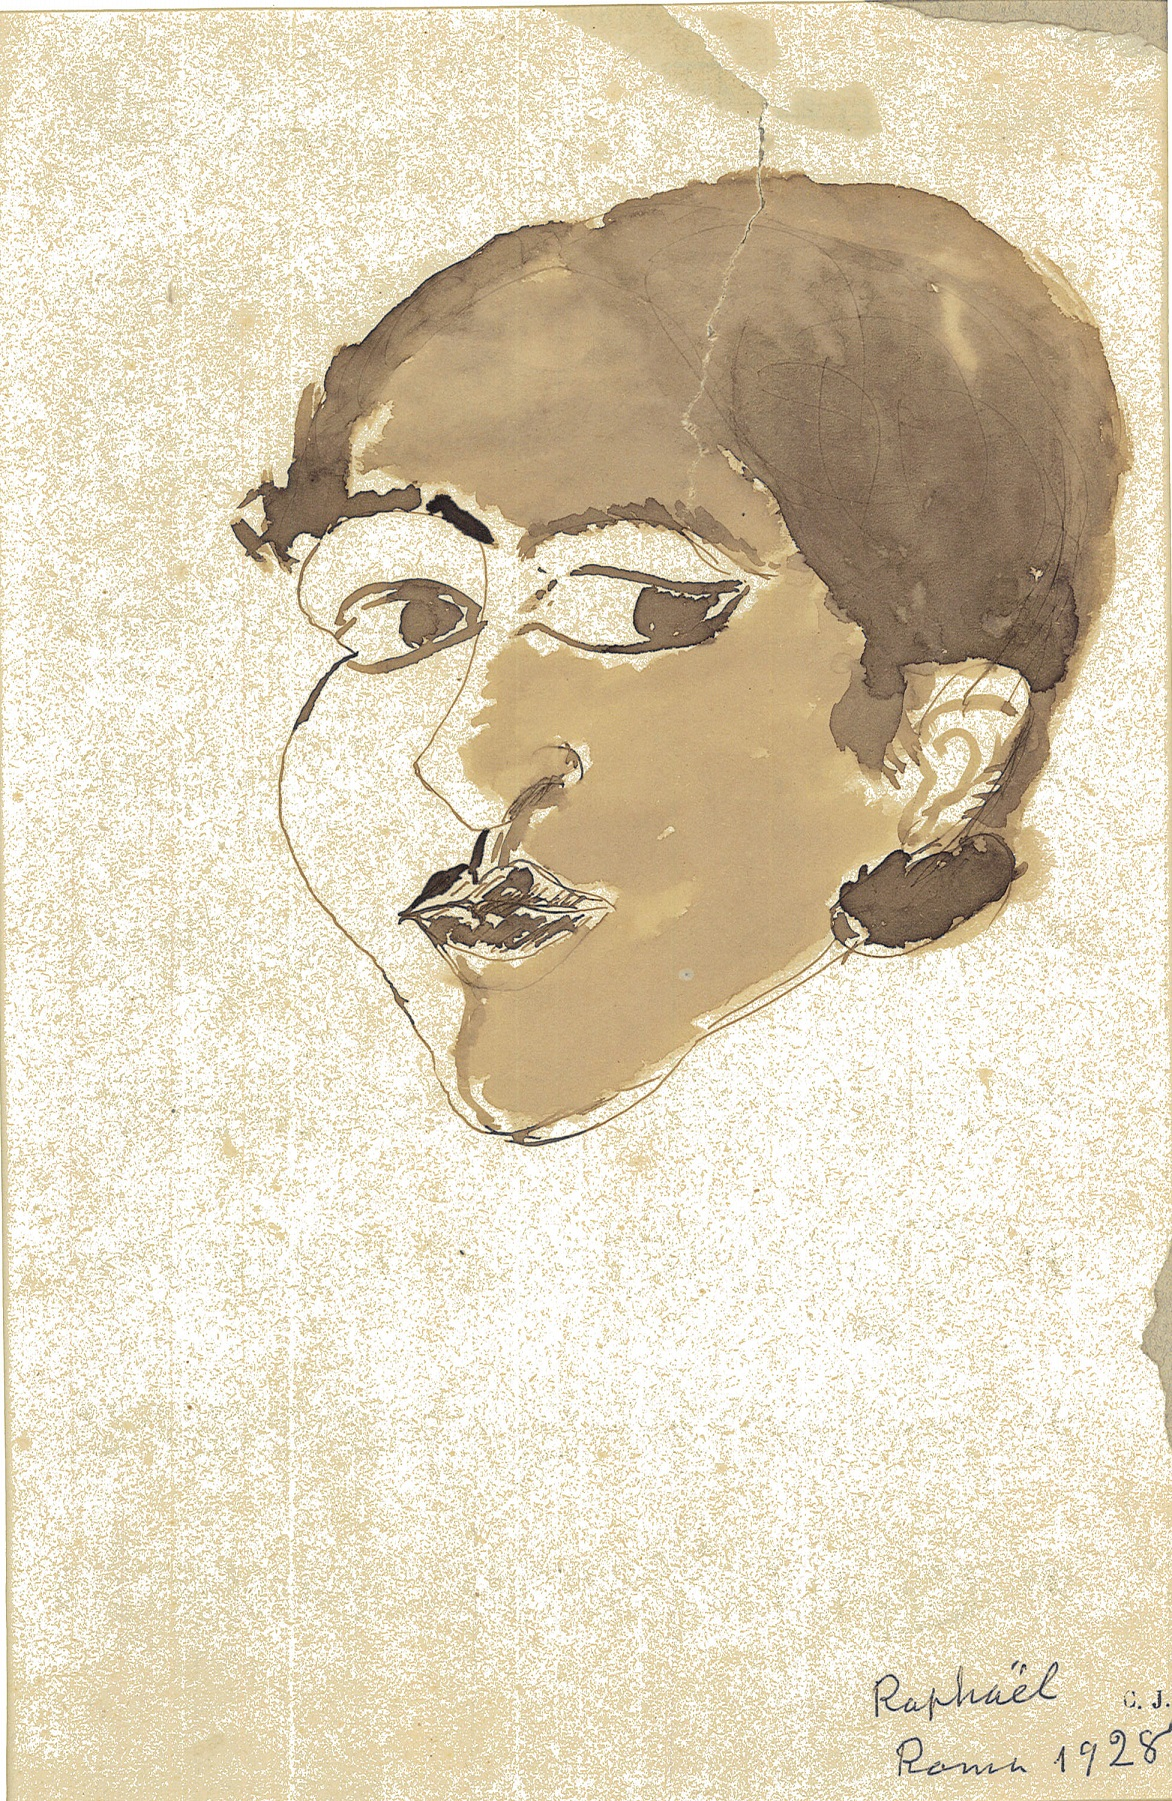 Antonietta Raphael, Autoritratto 1928